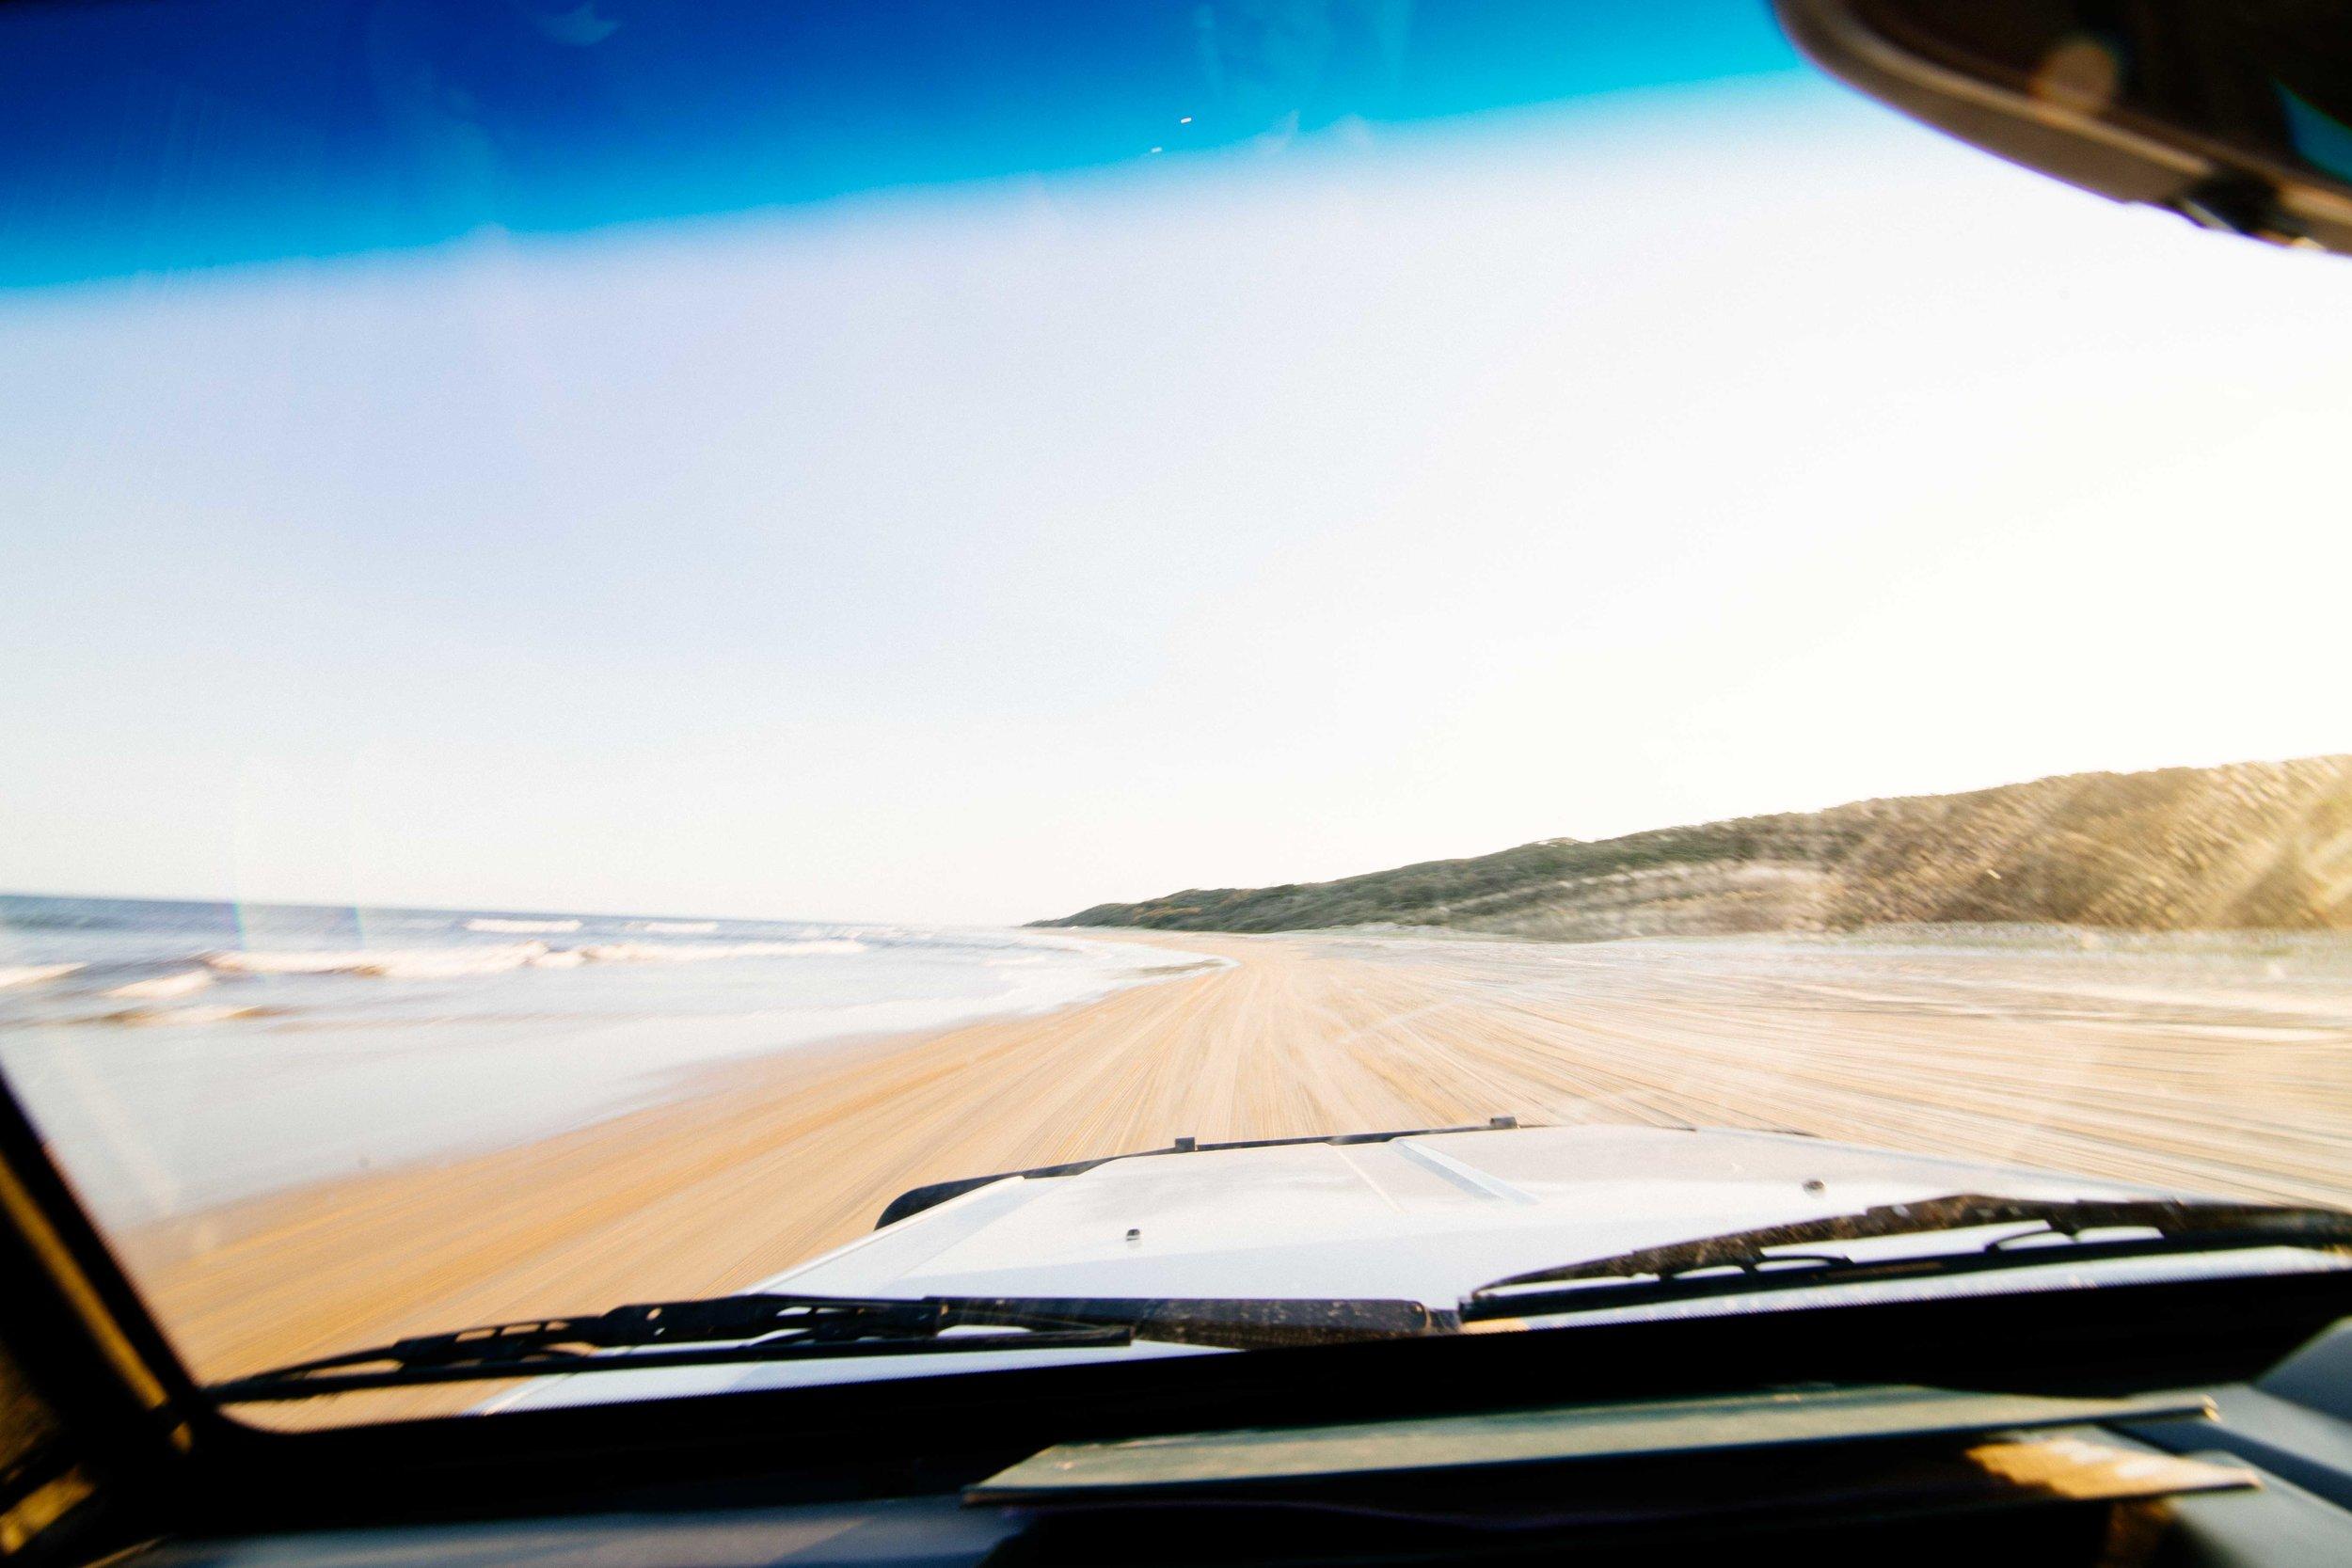 Driving on the beach! Photo: Marine Raynard